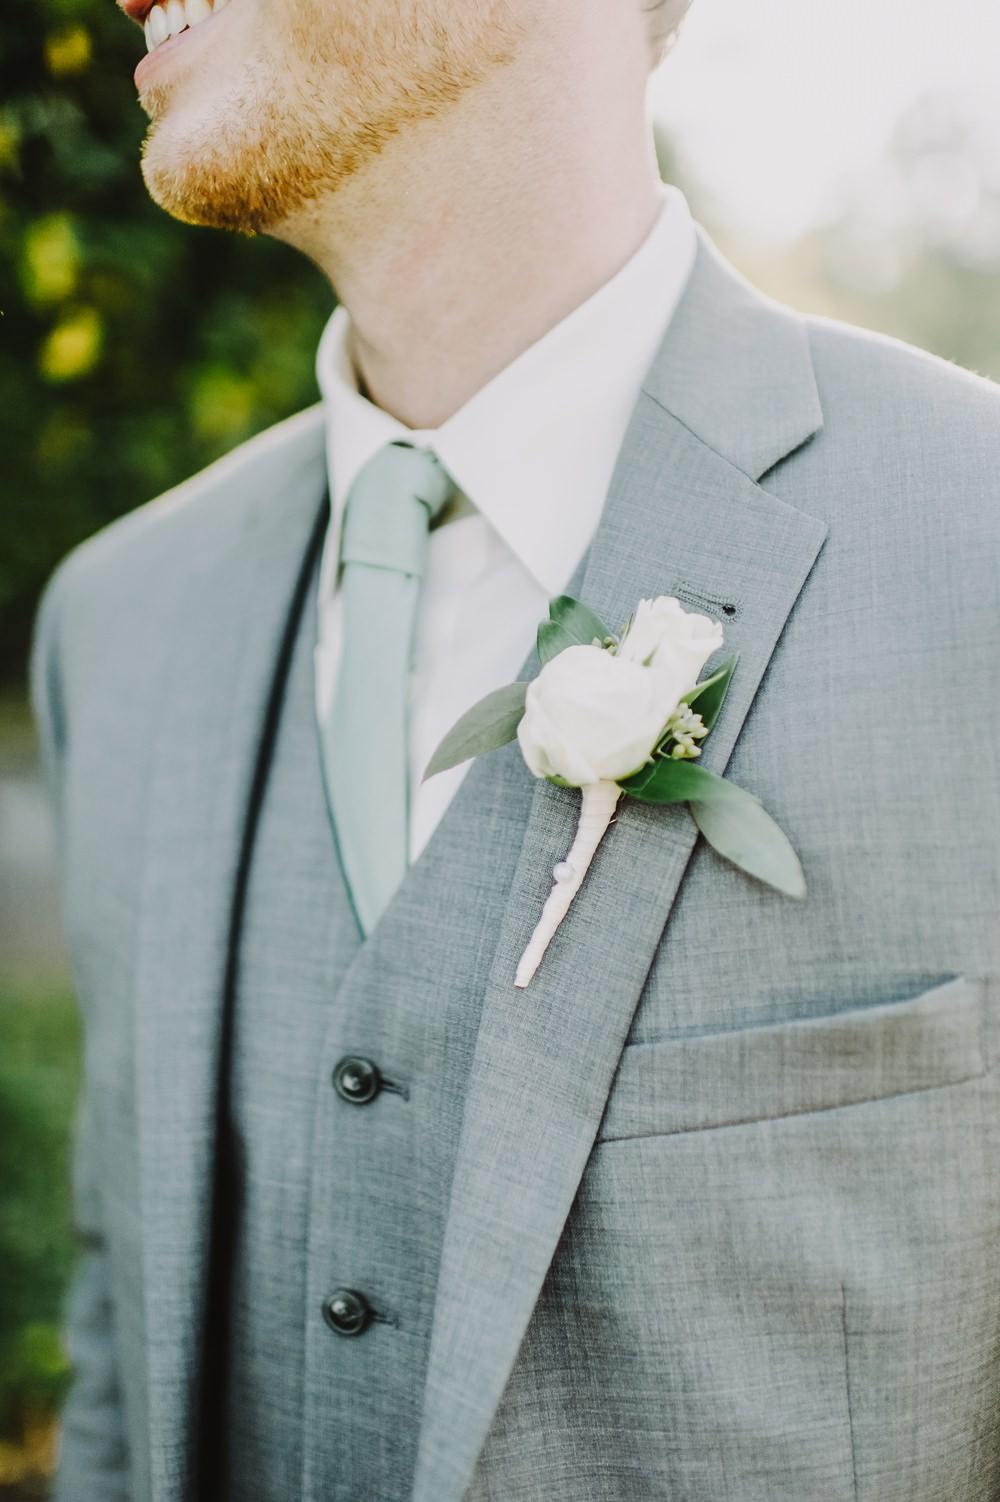 Groom Groomsmen Grey Suits Ties Green Buttonhole Maryland Wedding L. Hewitt Photography